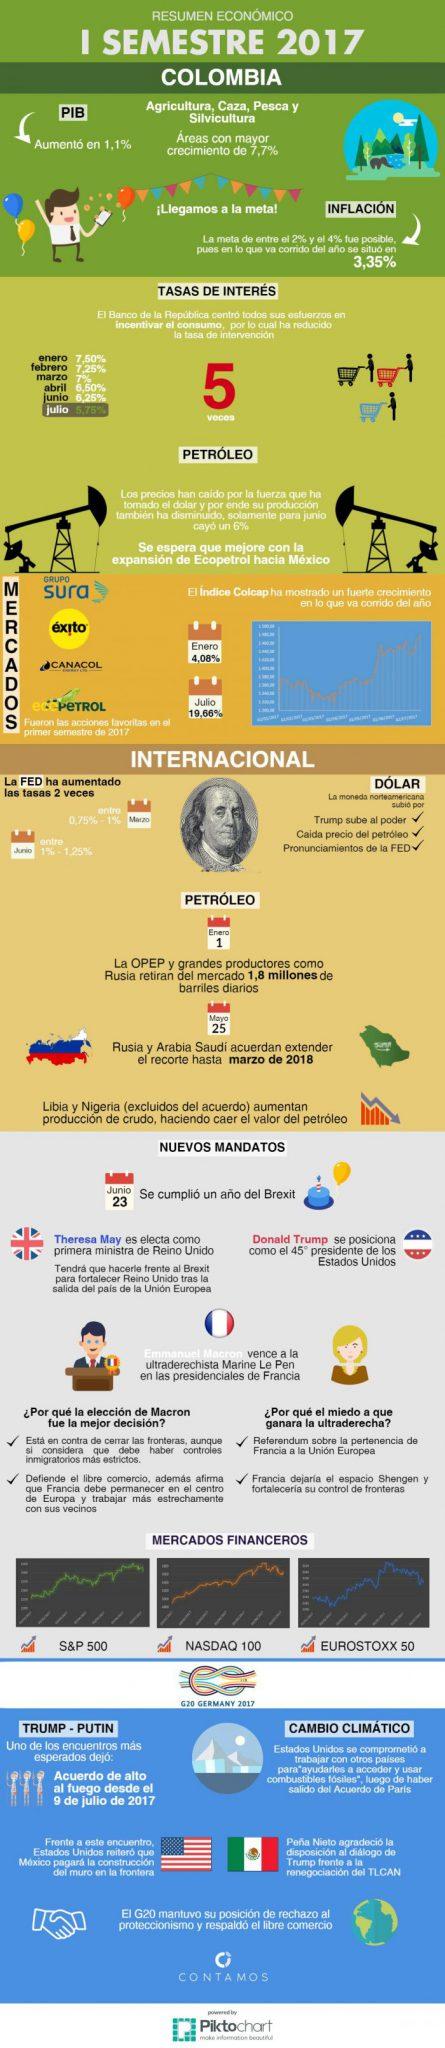 informe economico primer semestre 2017